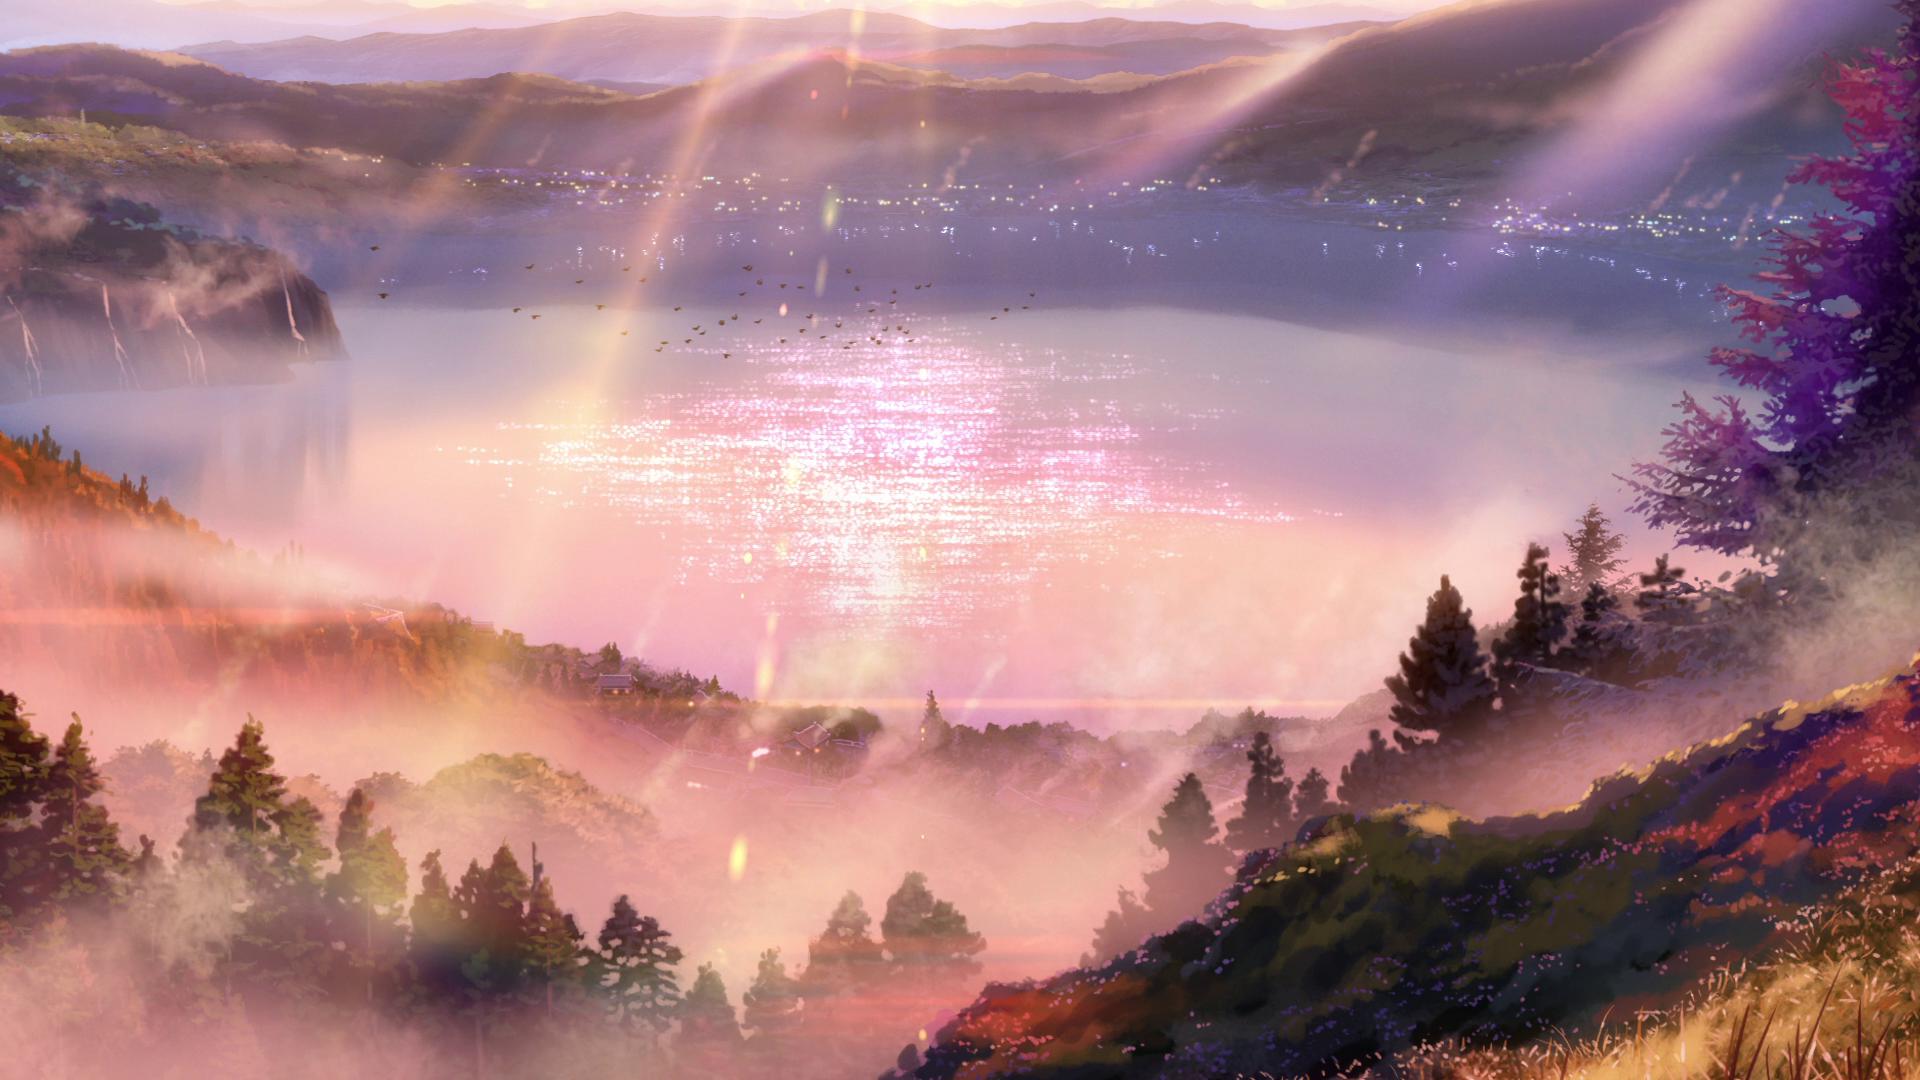 Wallpaper Kimi No Na Wa Your Name Landscape Mountains